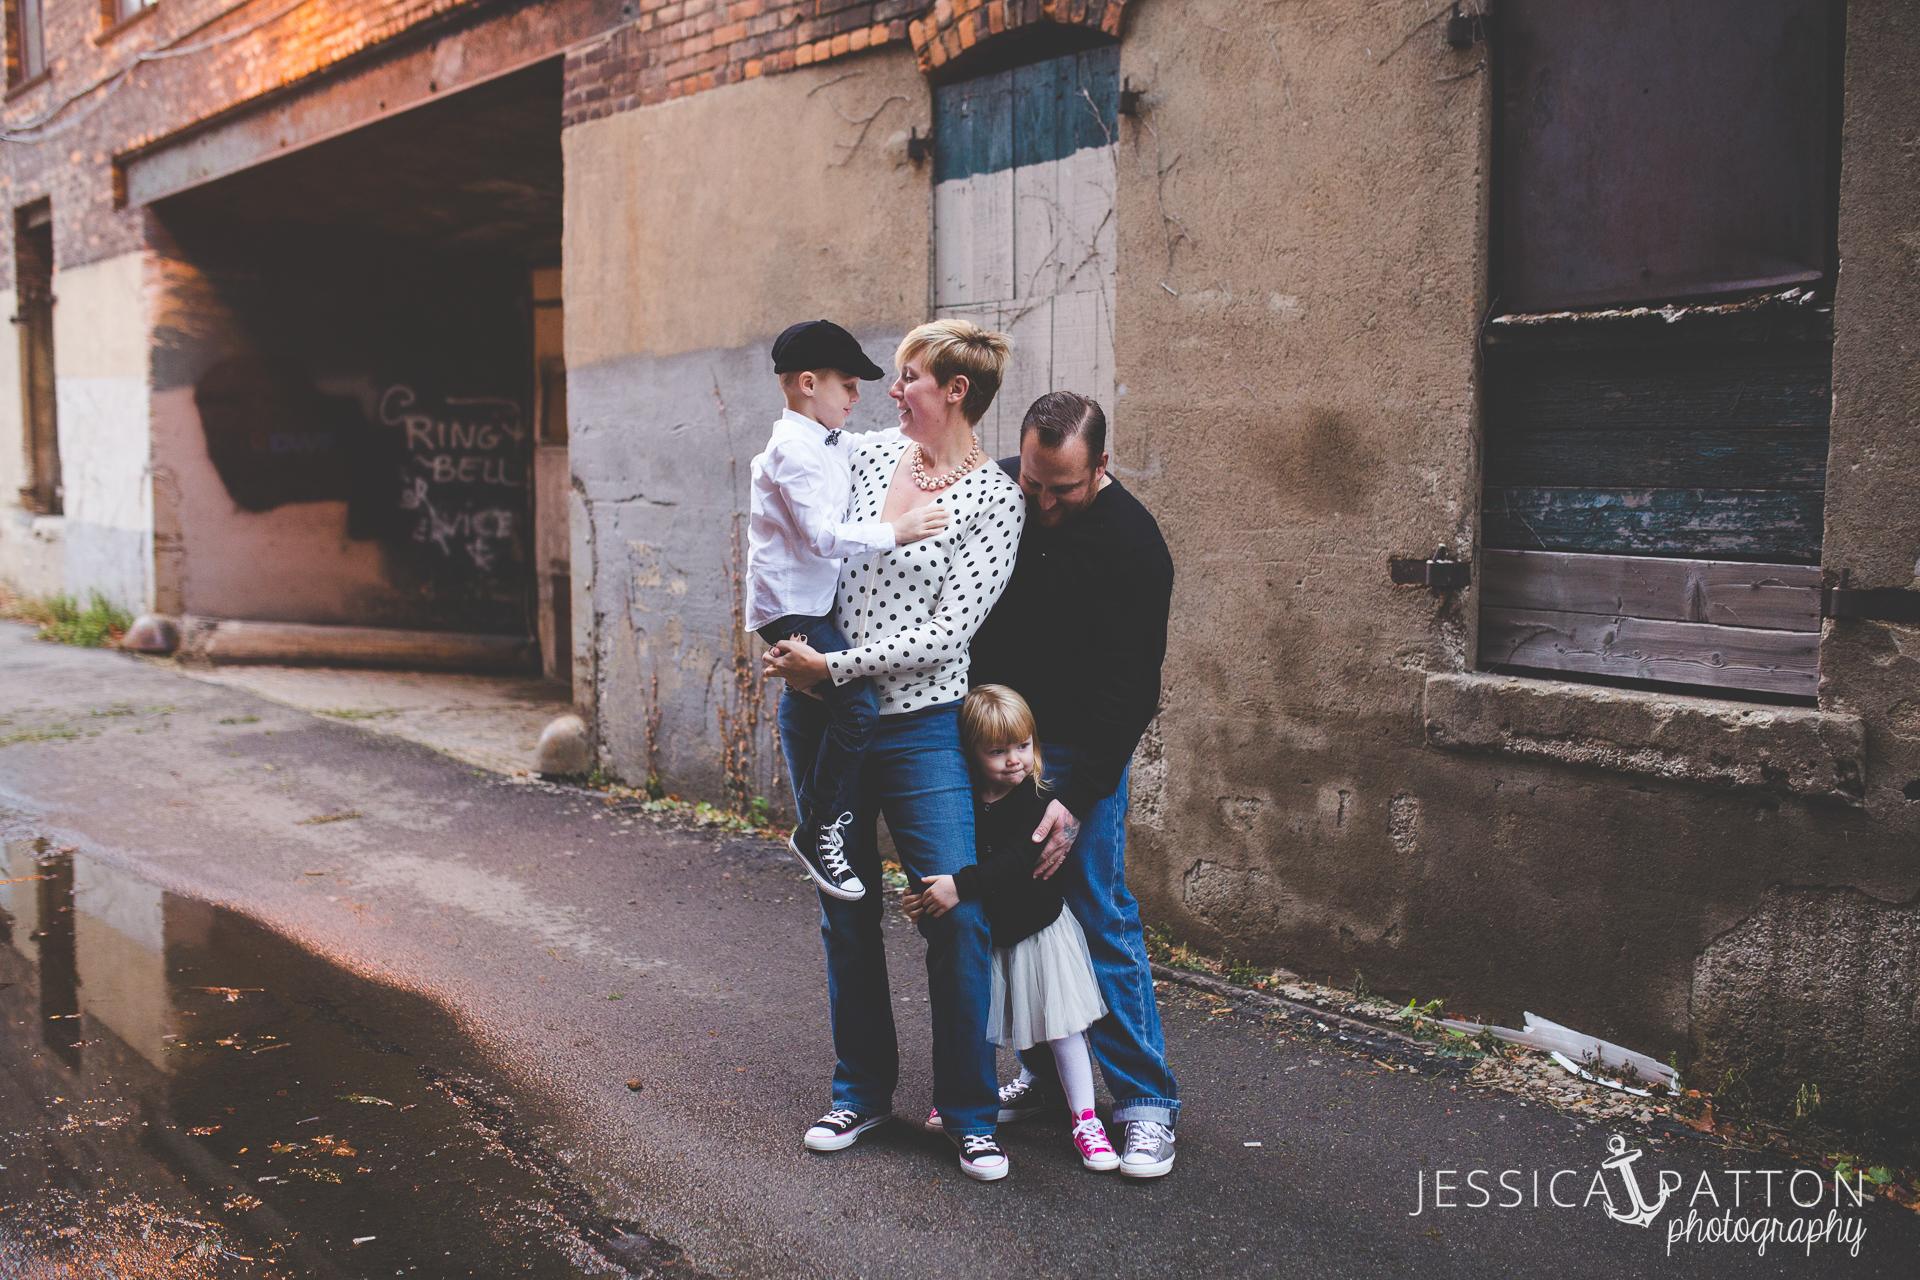 Poupard Family Session - 11-23-14